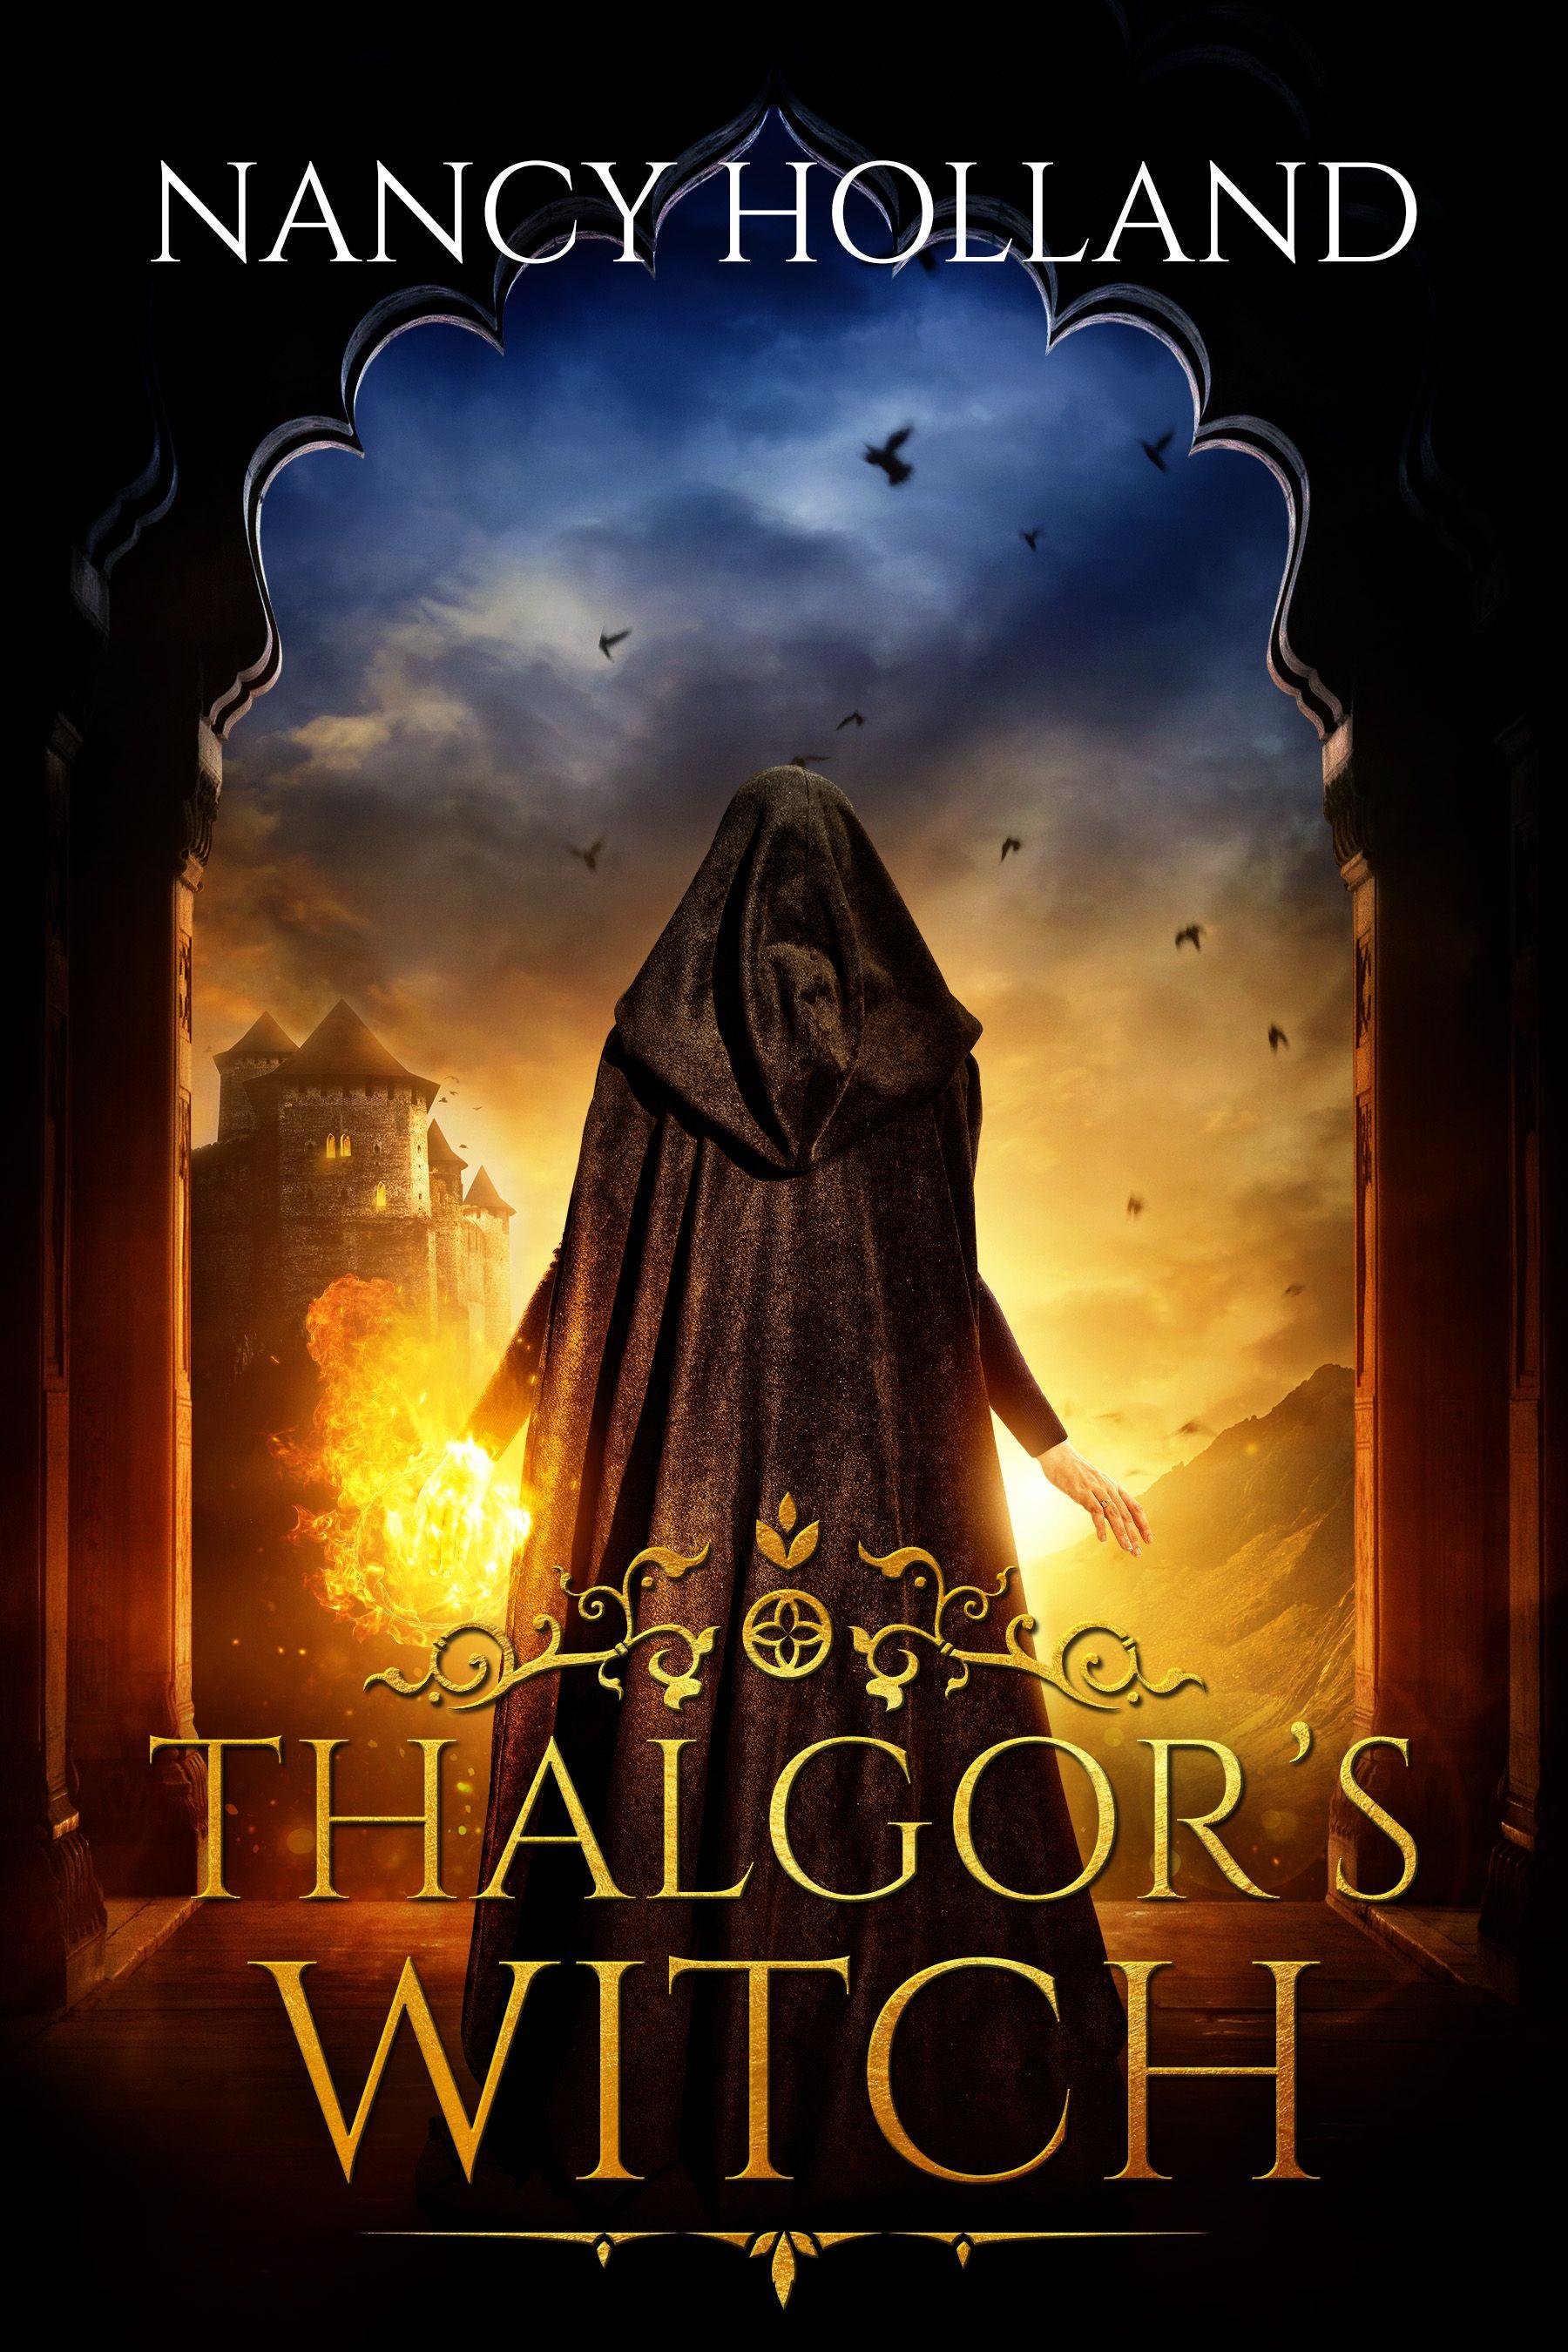 Science Fiction Fantasy Book Cover Design By Milo Deranged Doctor Design Epic Fantasy Books High Fantasy Fantasy Book Covers